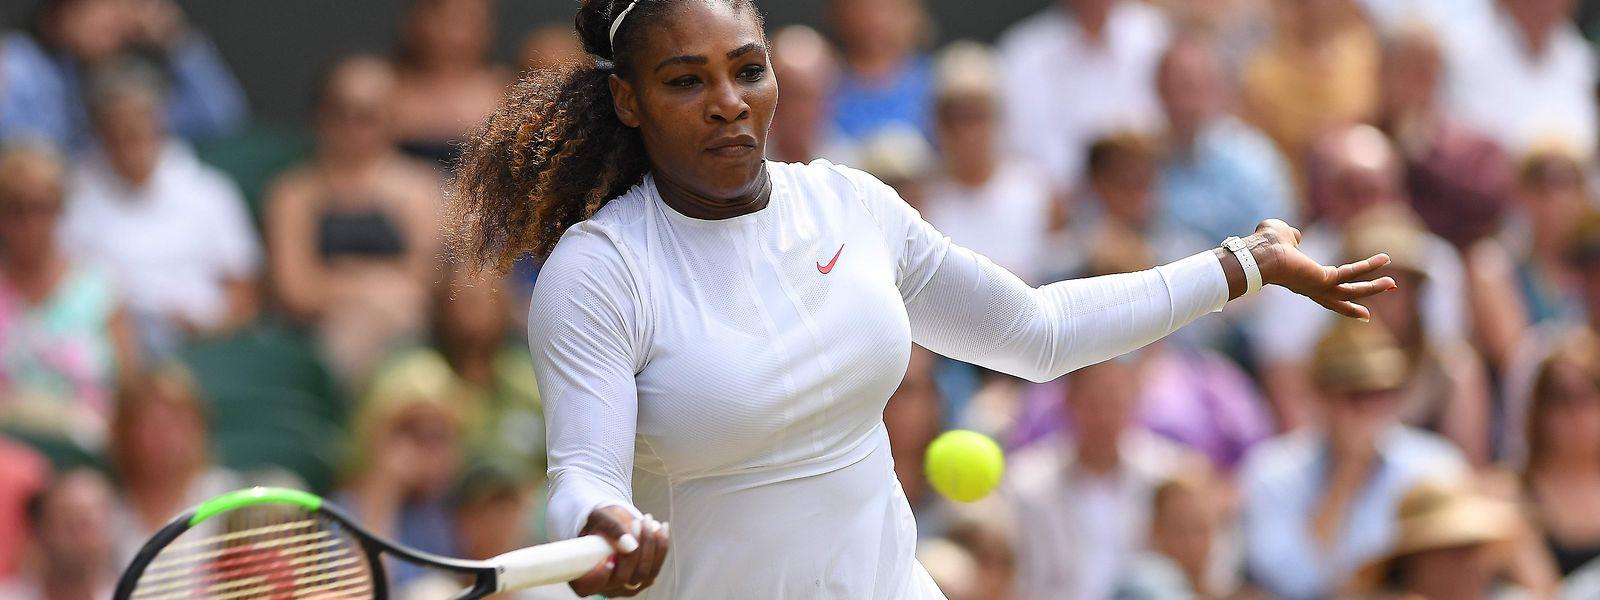 Serena Williams disputera samedi sa dixième finale à Wimbledon